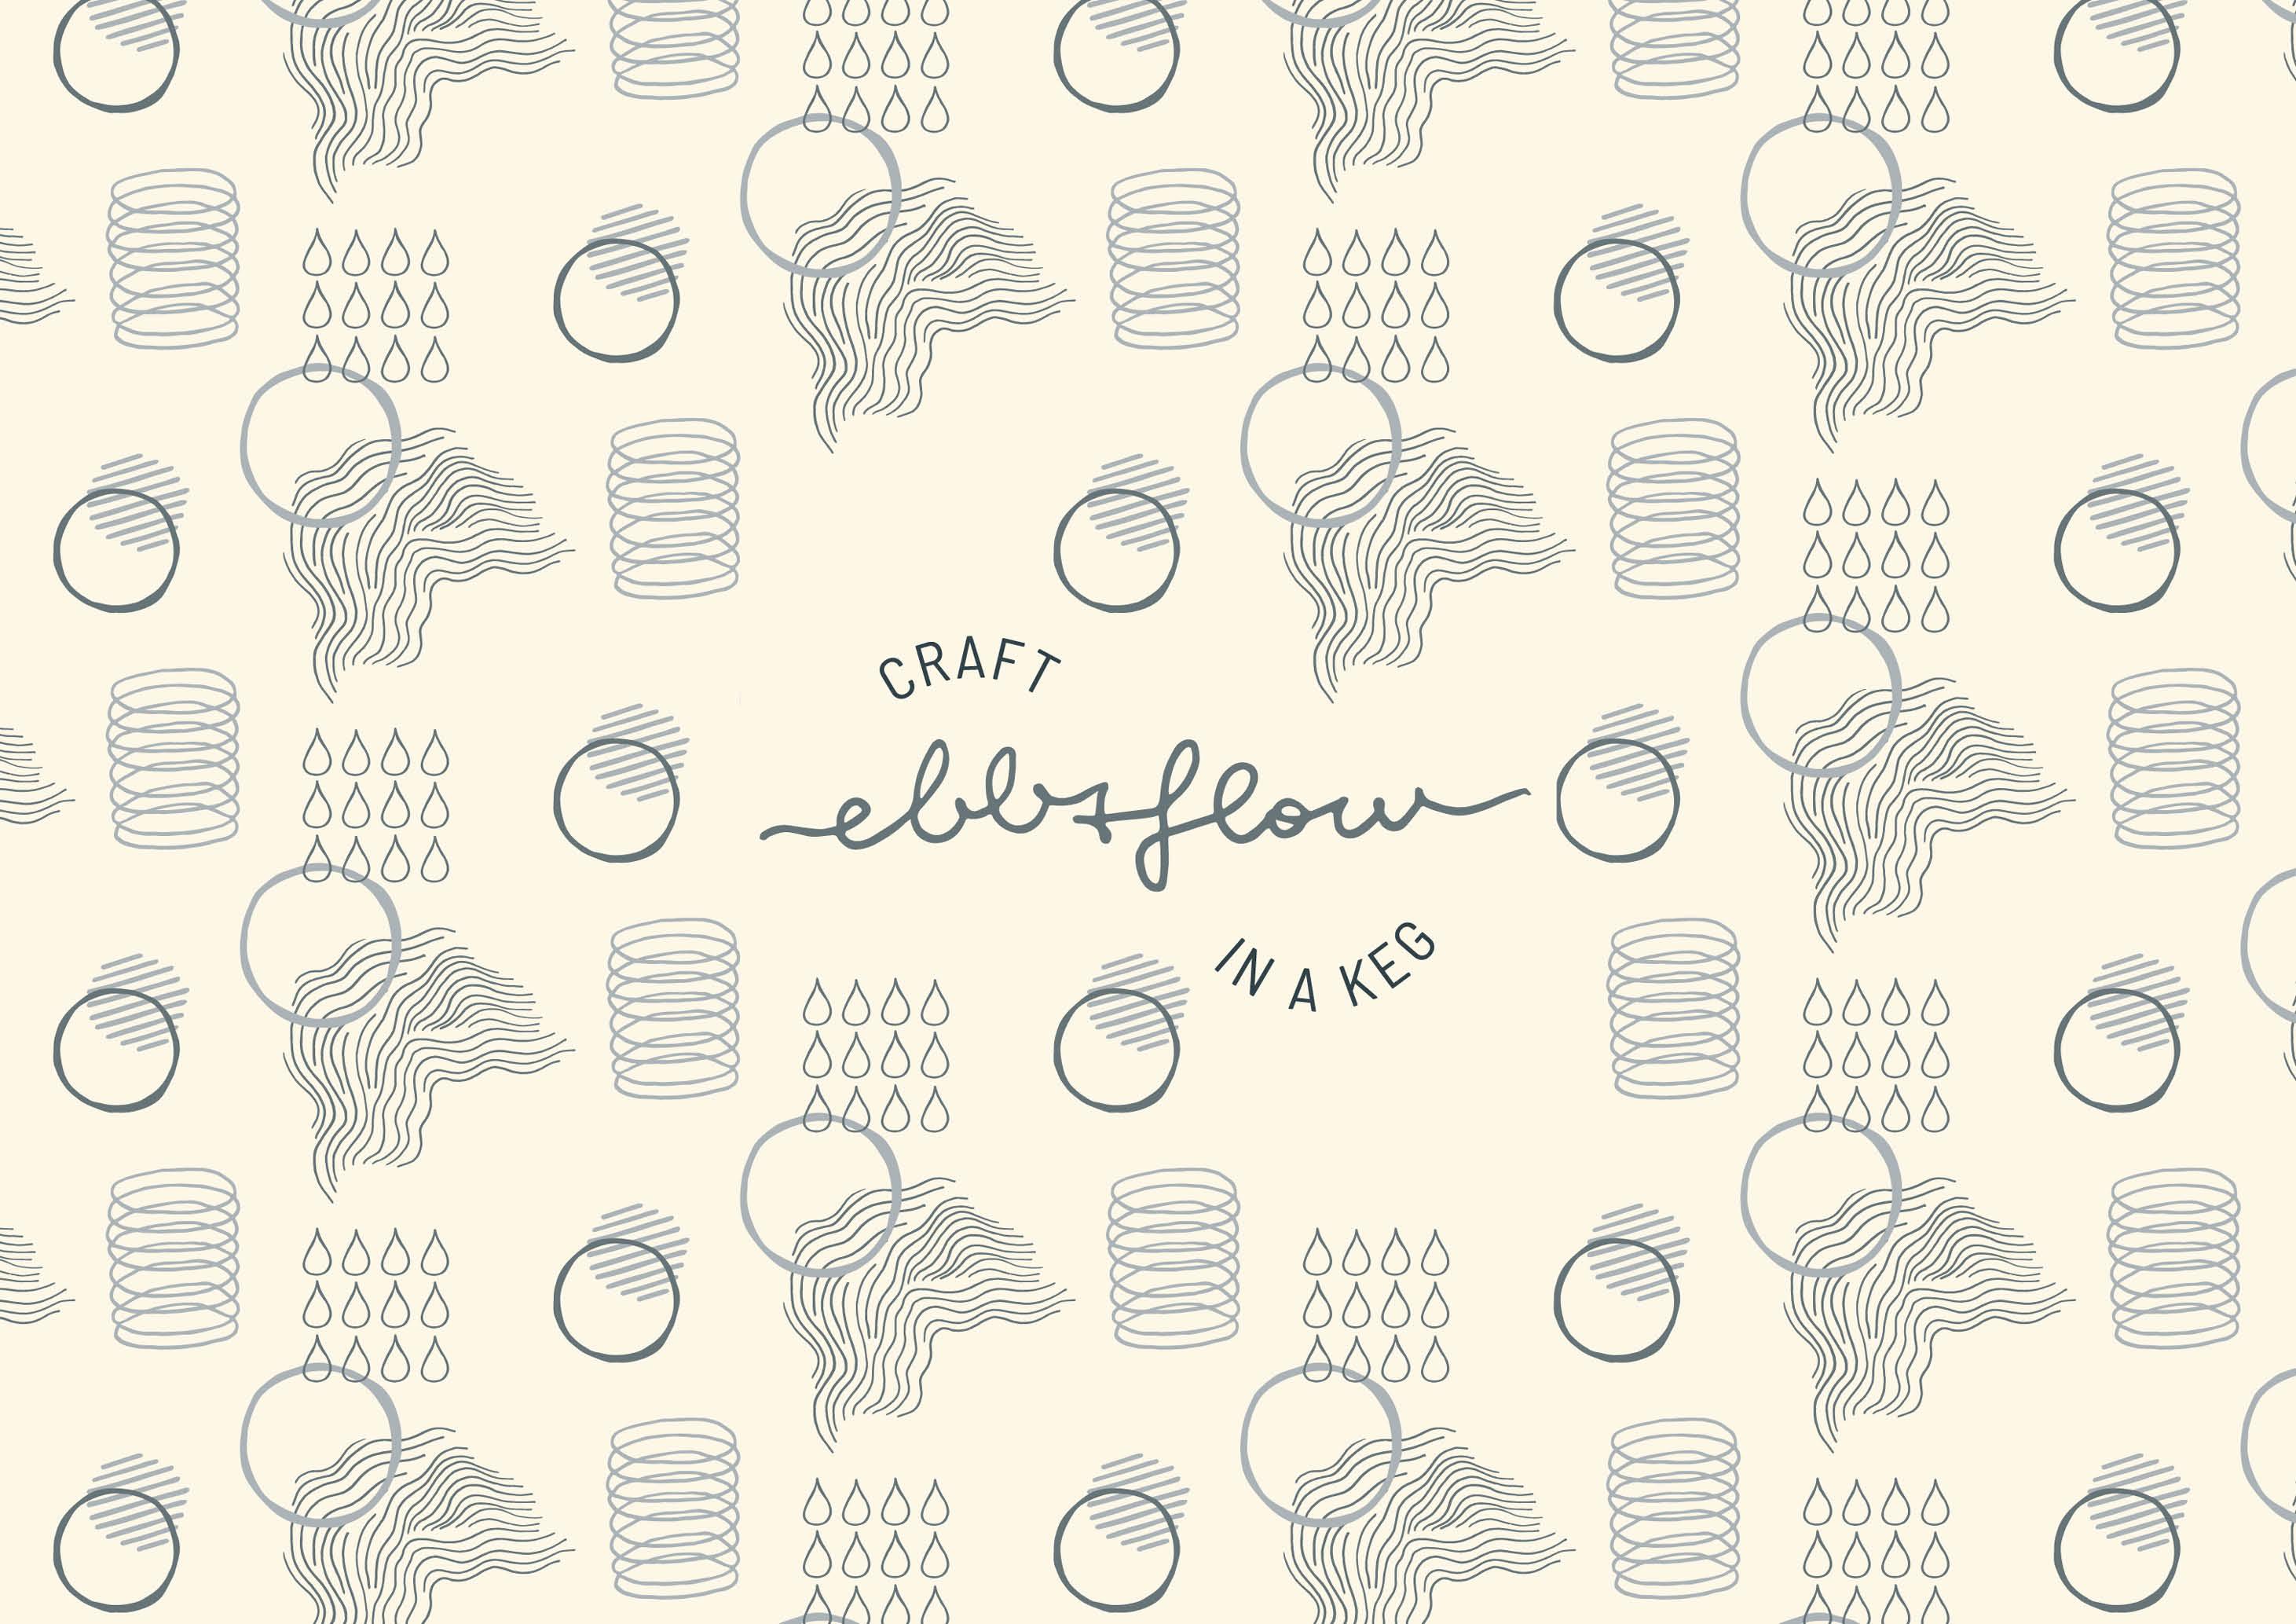 Ebb&Flow Keg Brand Identity - Design by Magdalena Weiss